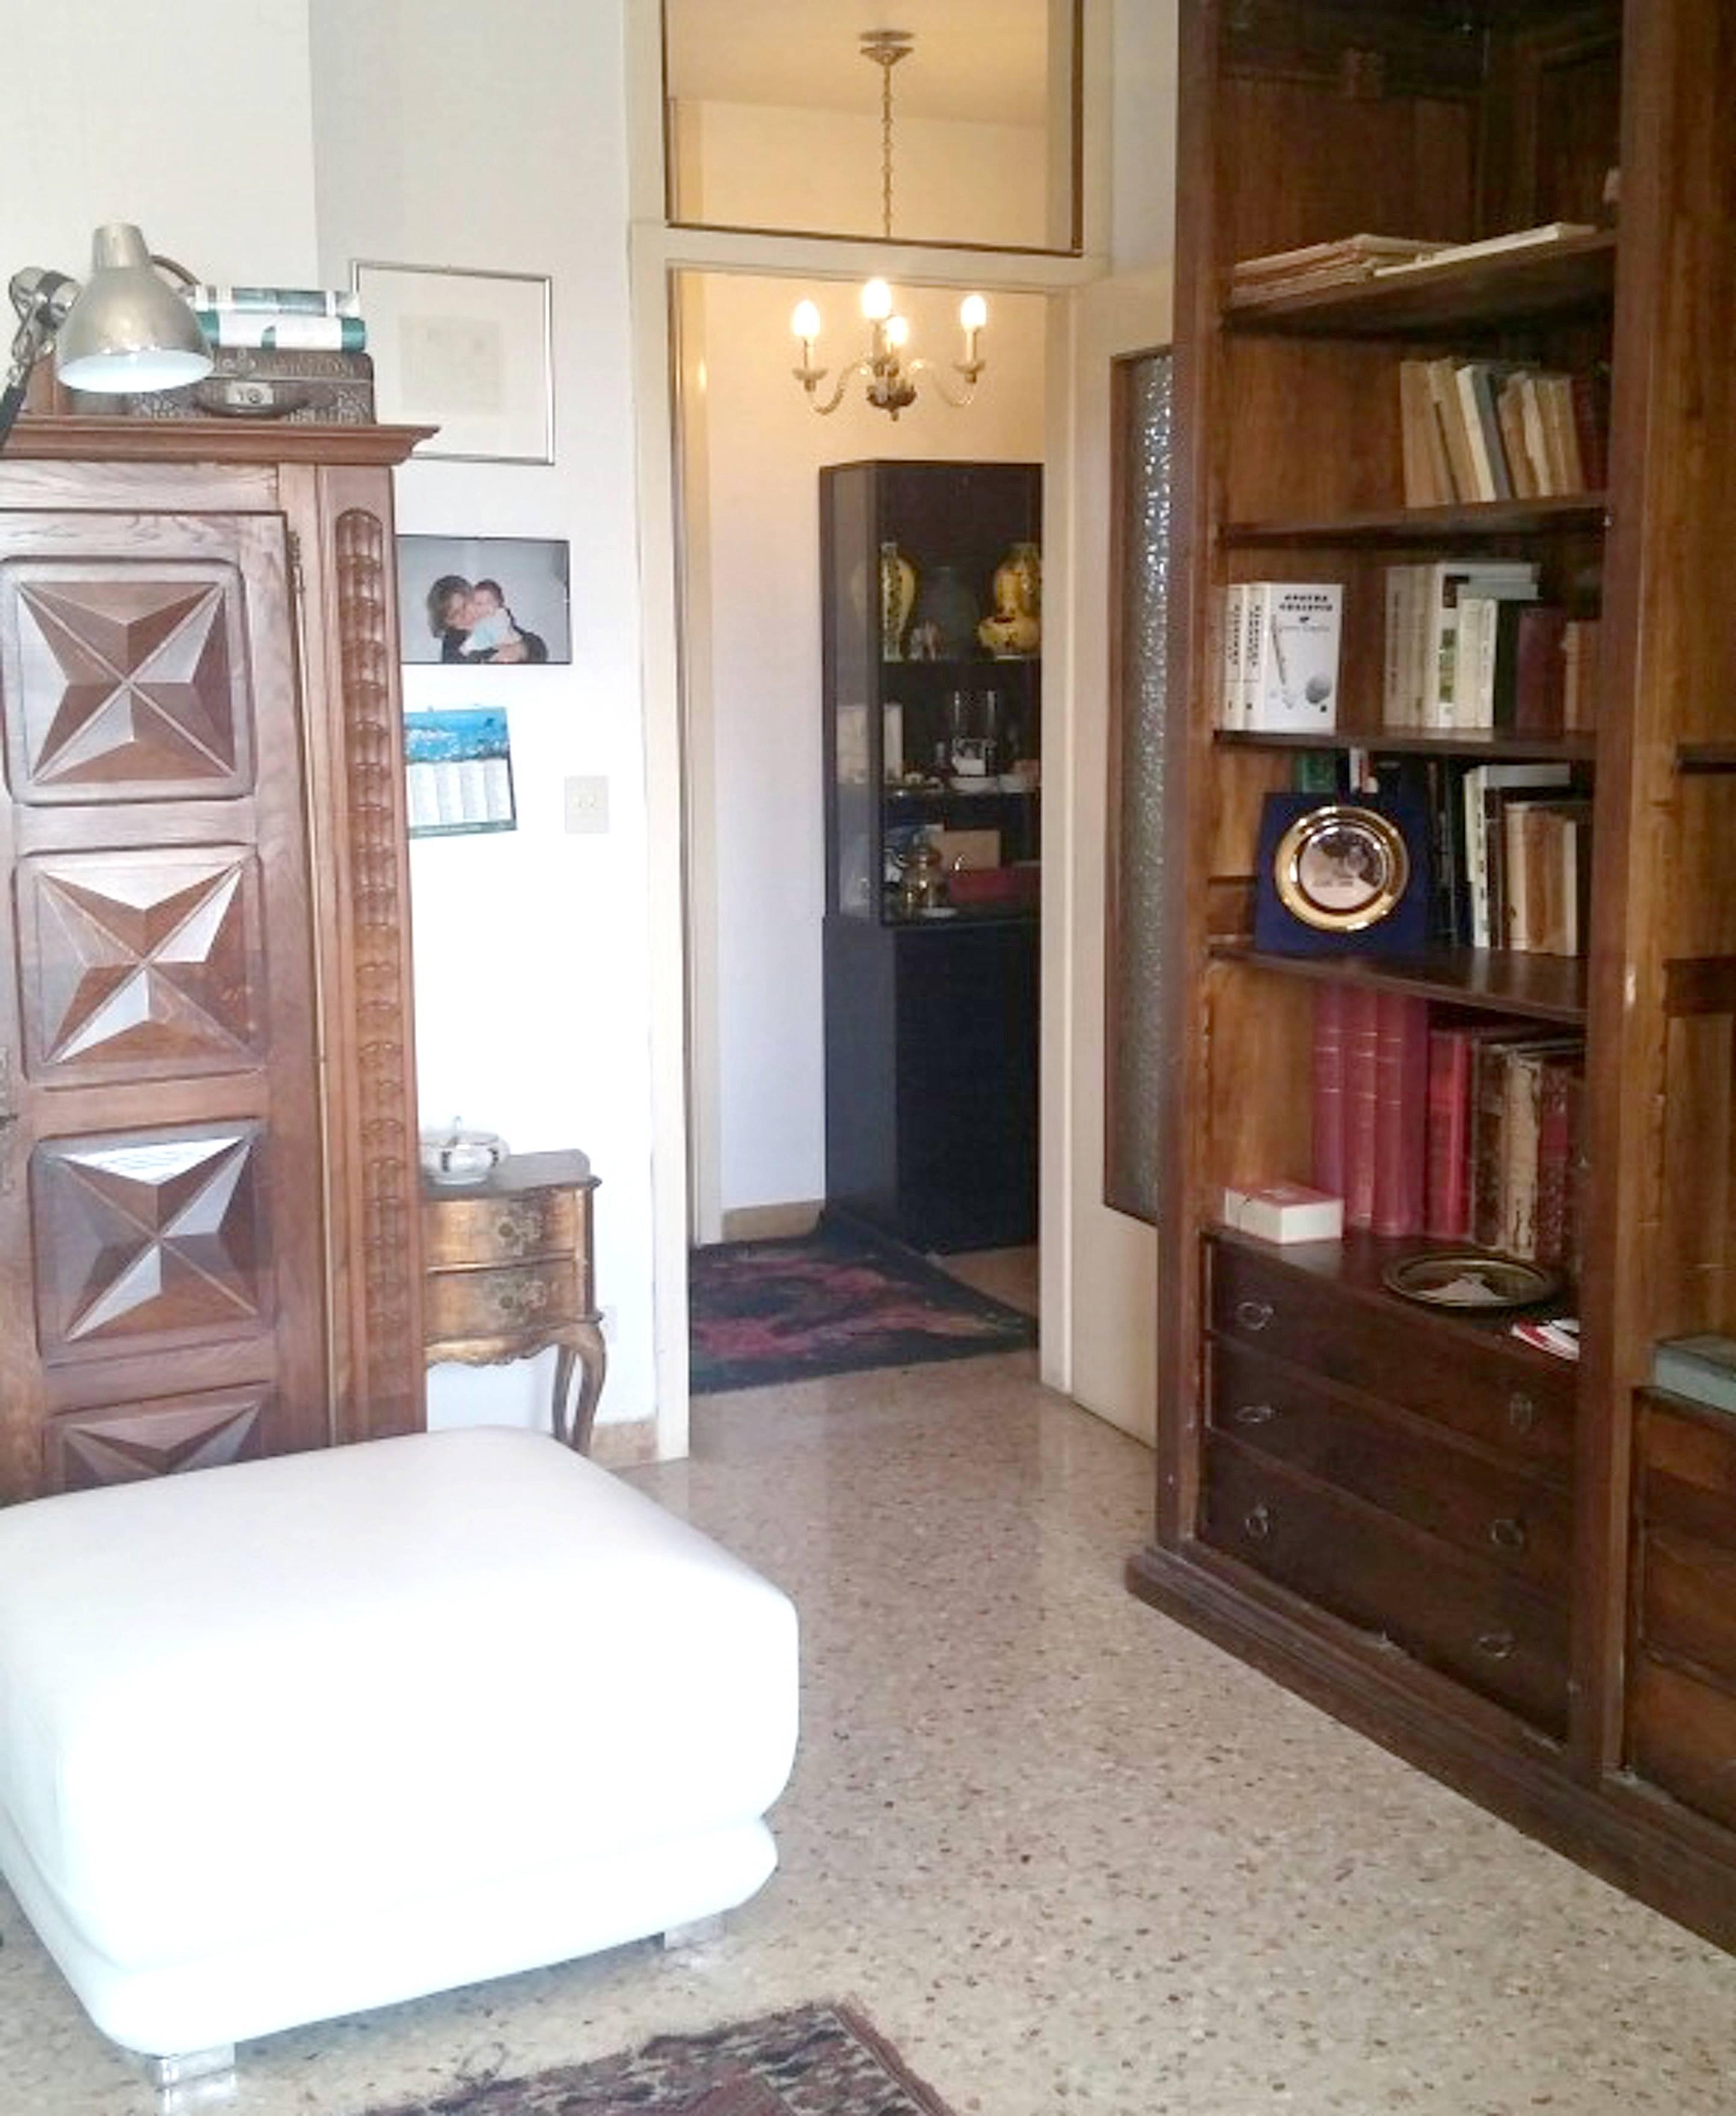 affitti case vacanze palmanova udine appartamenti case